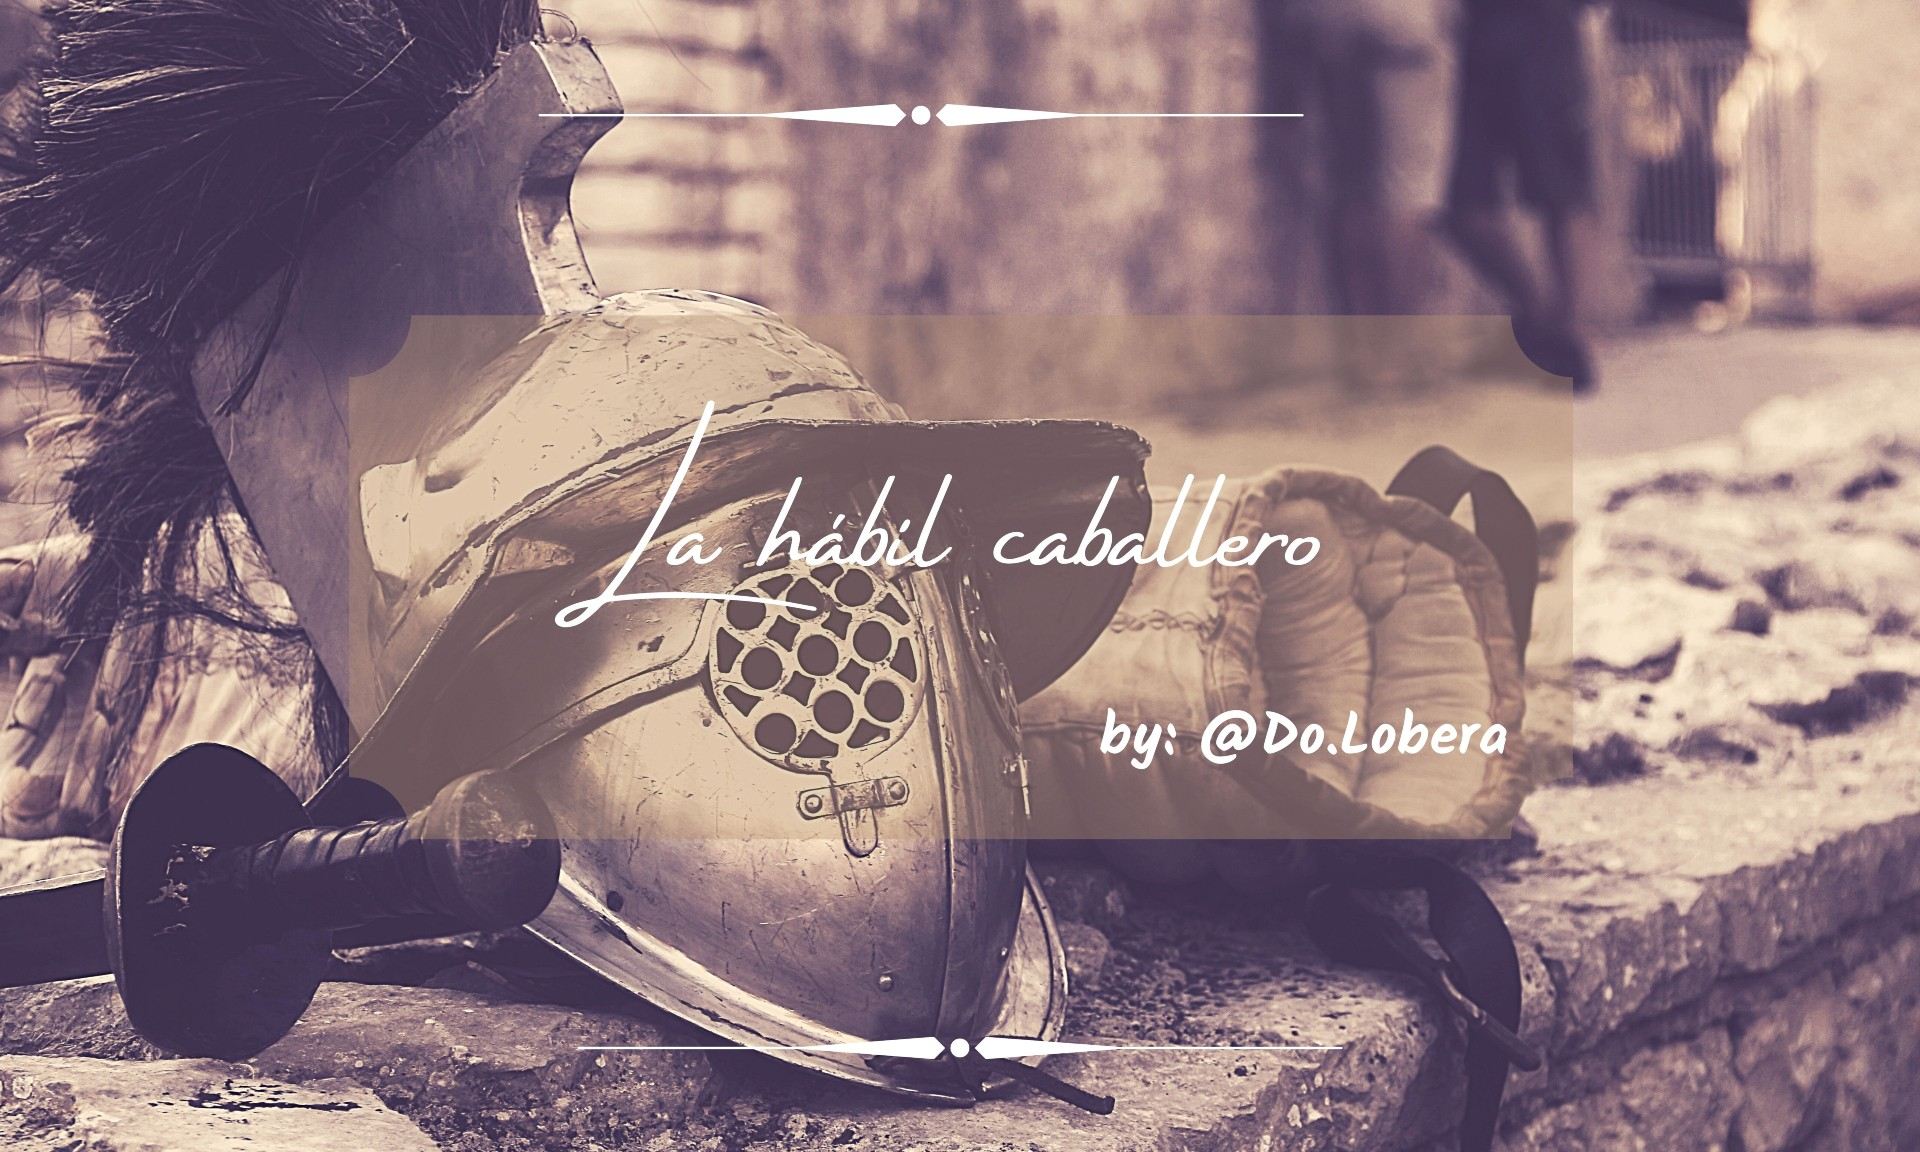 la hábil caballero - by Do.lobera